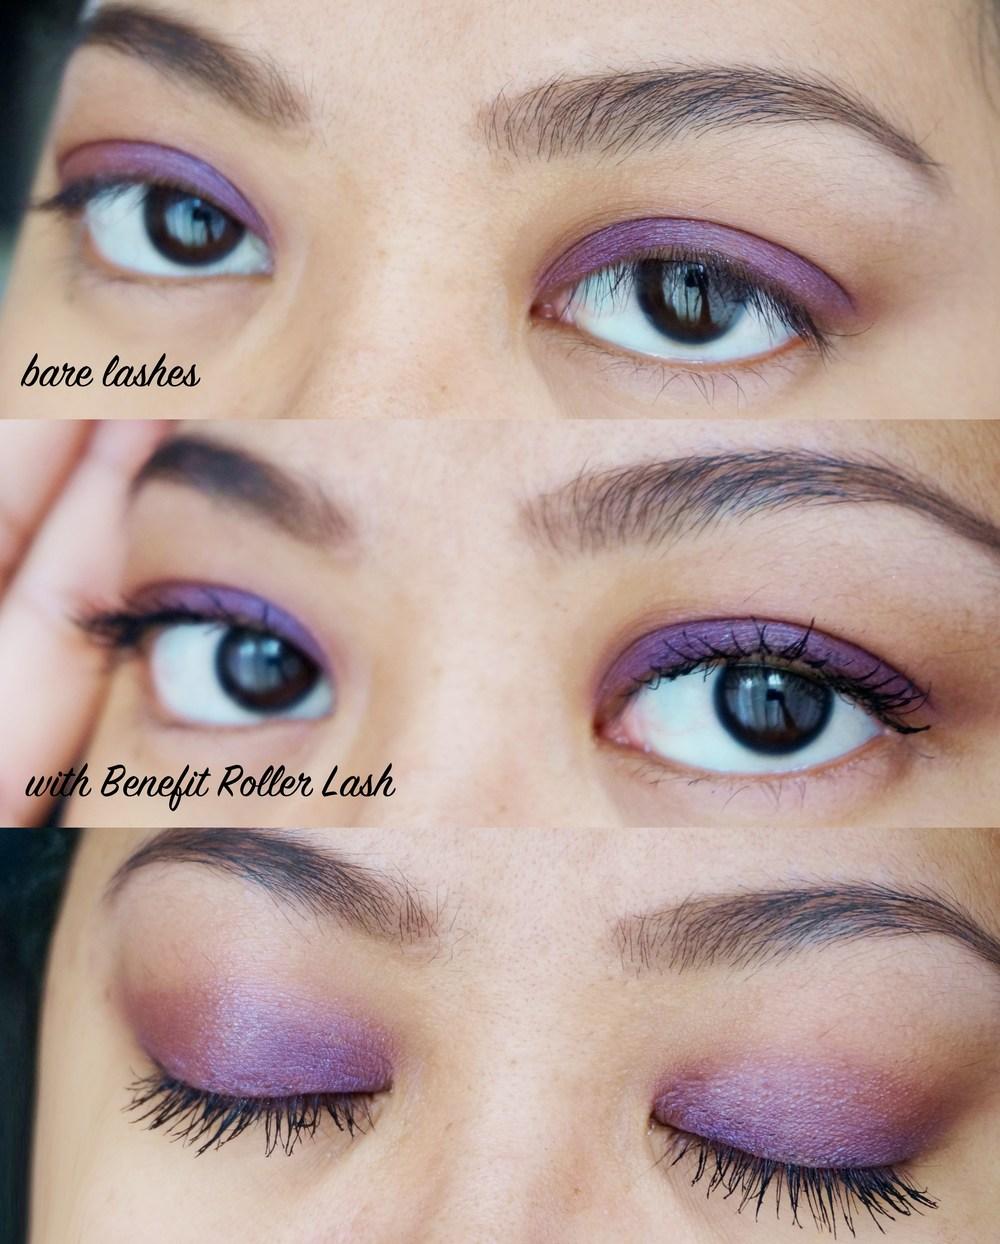 Benefit Roller Lash On Eyes.jpg